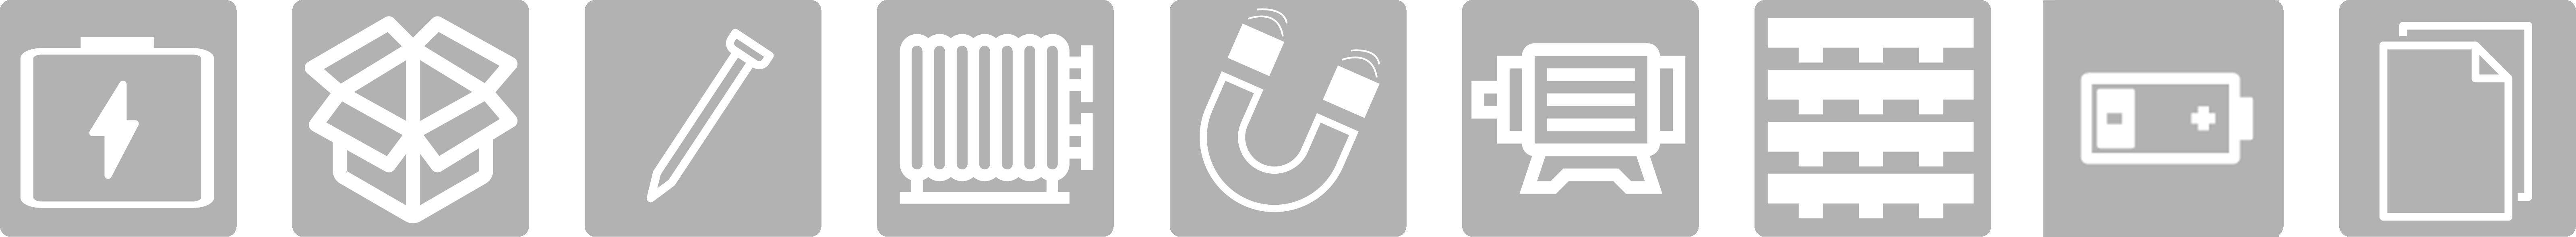 icones-recyclage